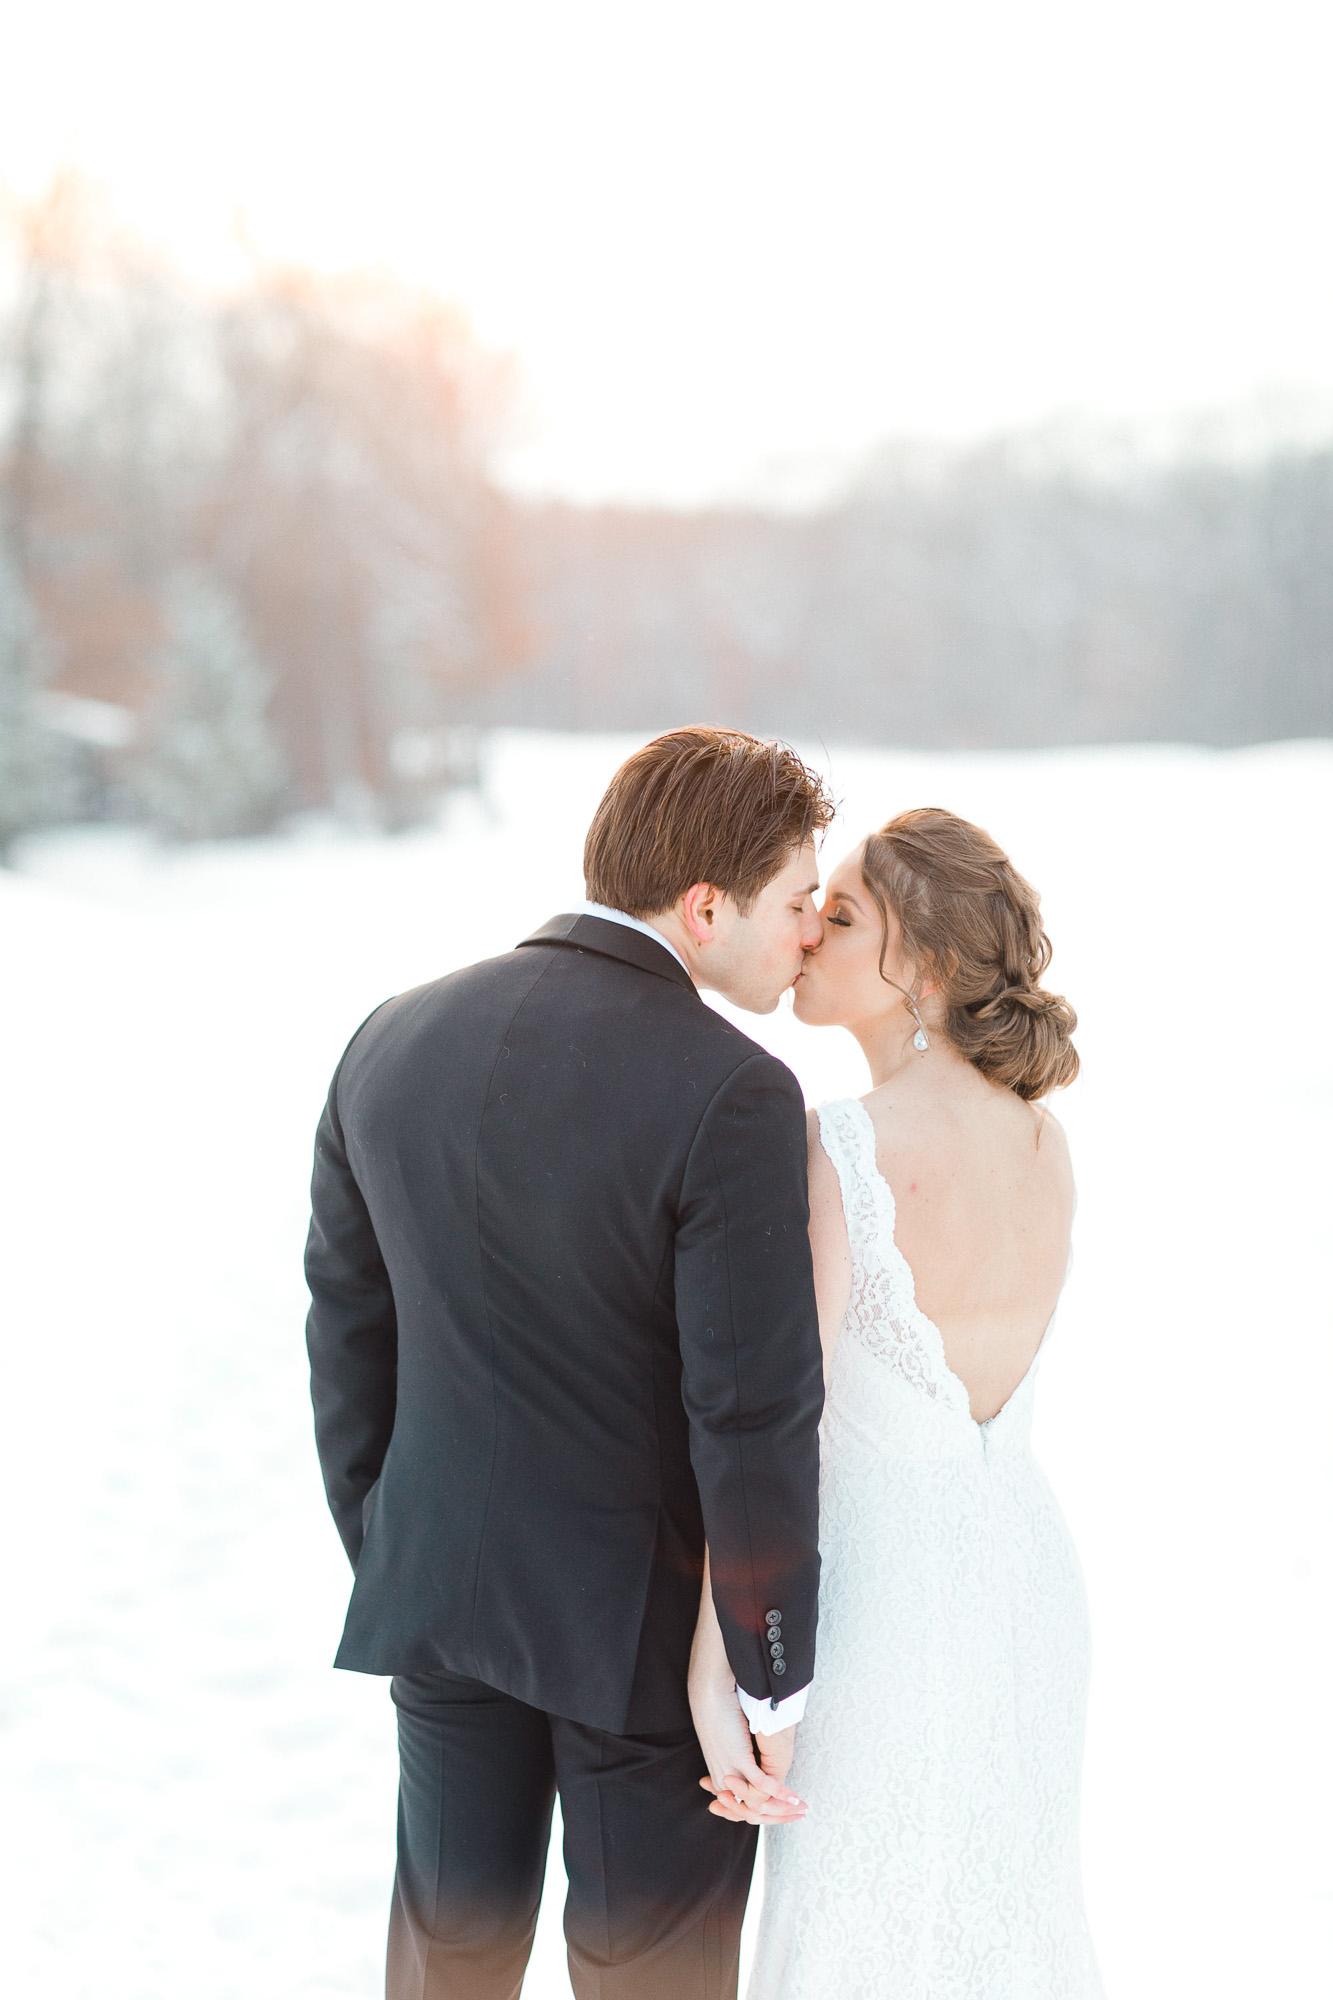 snowy-sand-springs-country-club-drums-pa-christmas-wedding-24915.jpg